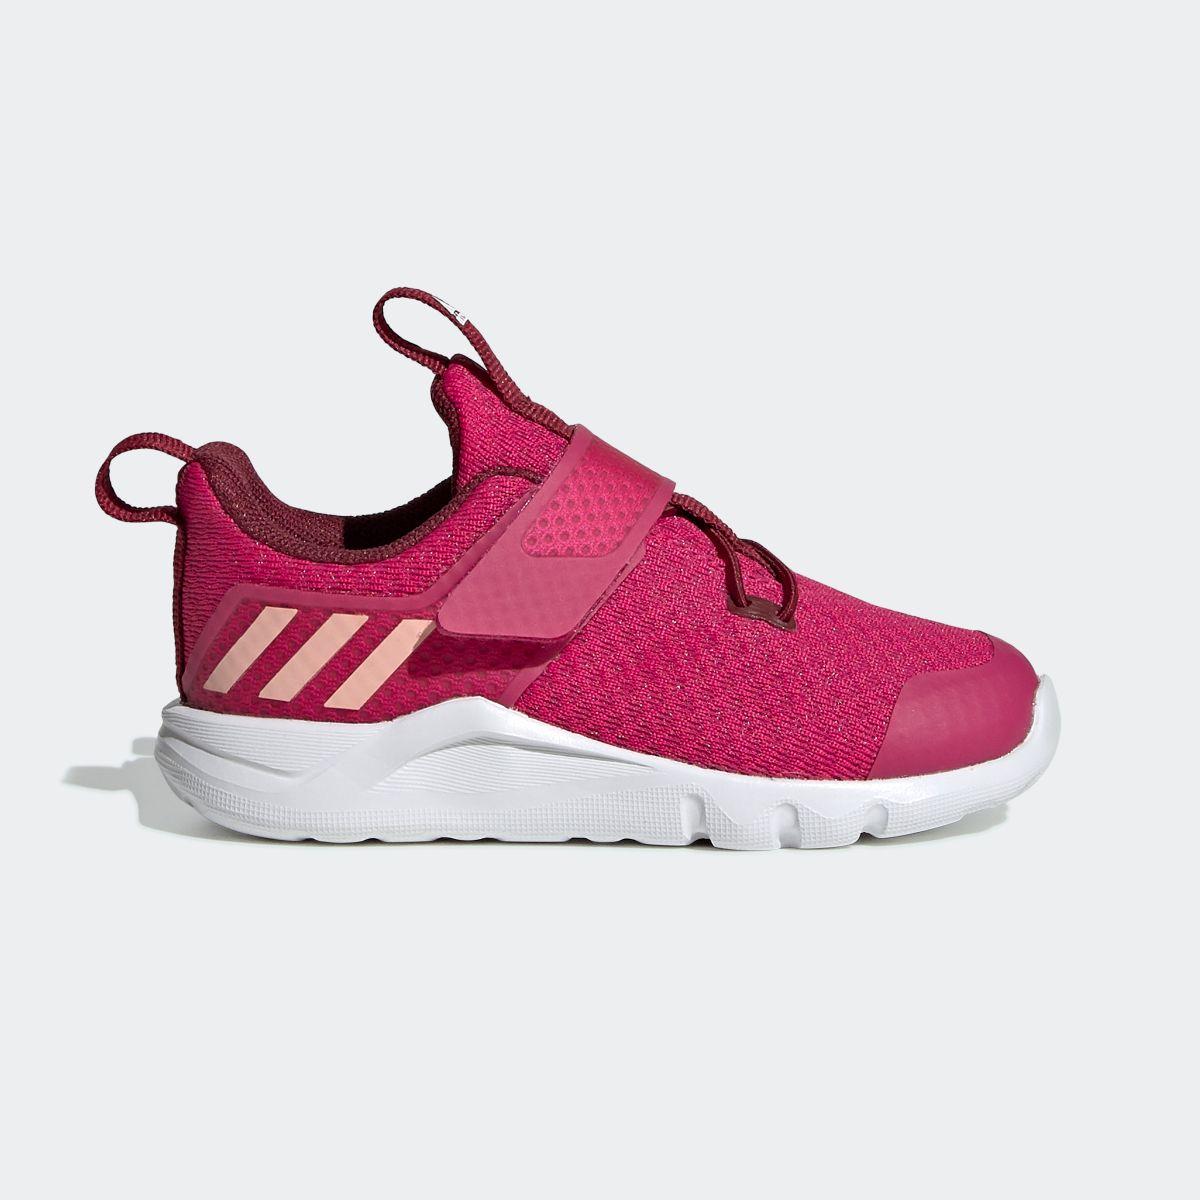 Girls Pink adidas Rapidaflex El Sneakers Casual